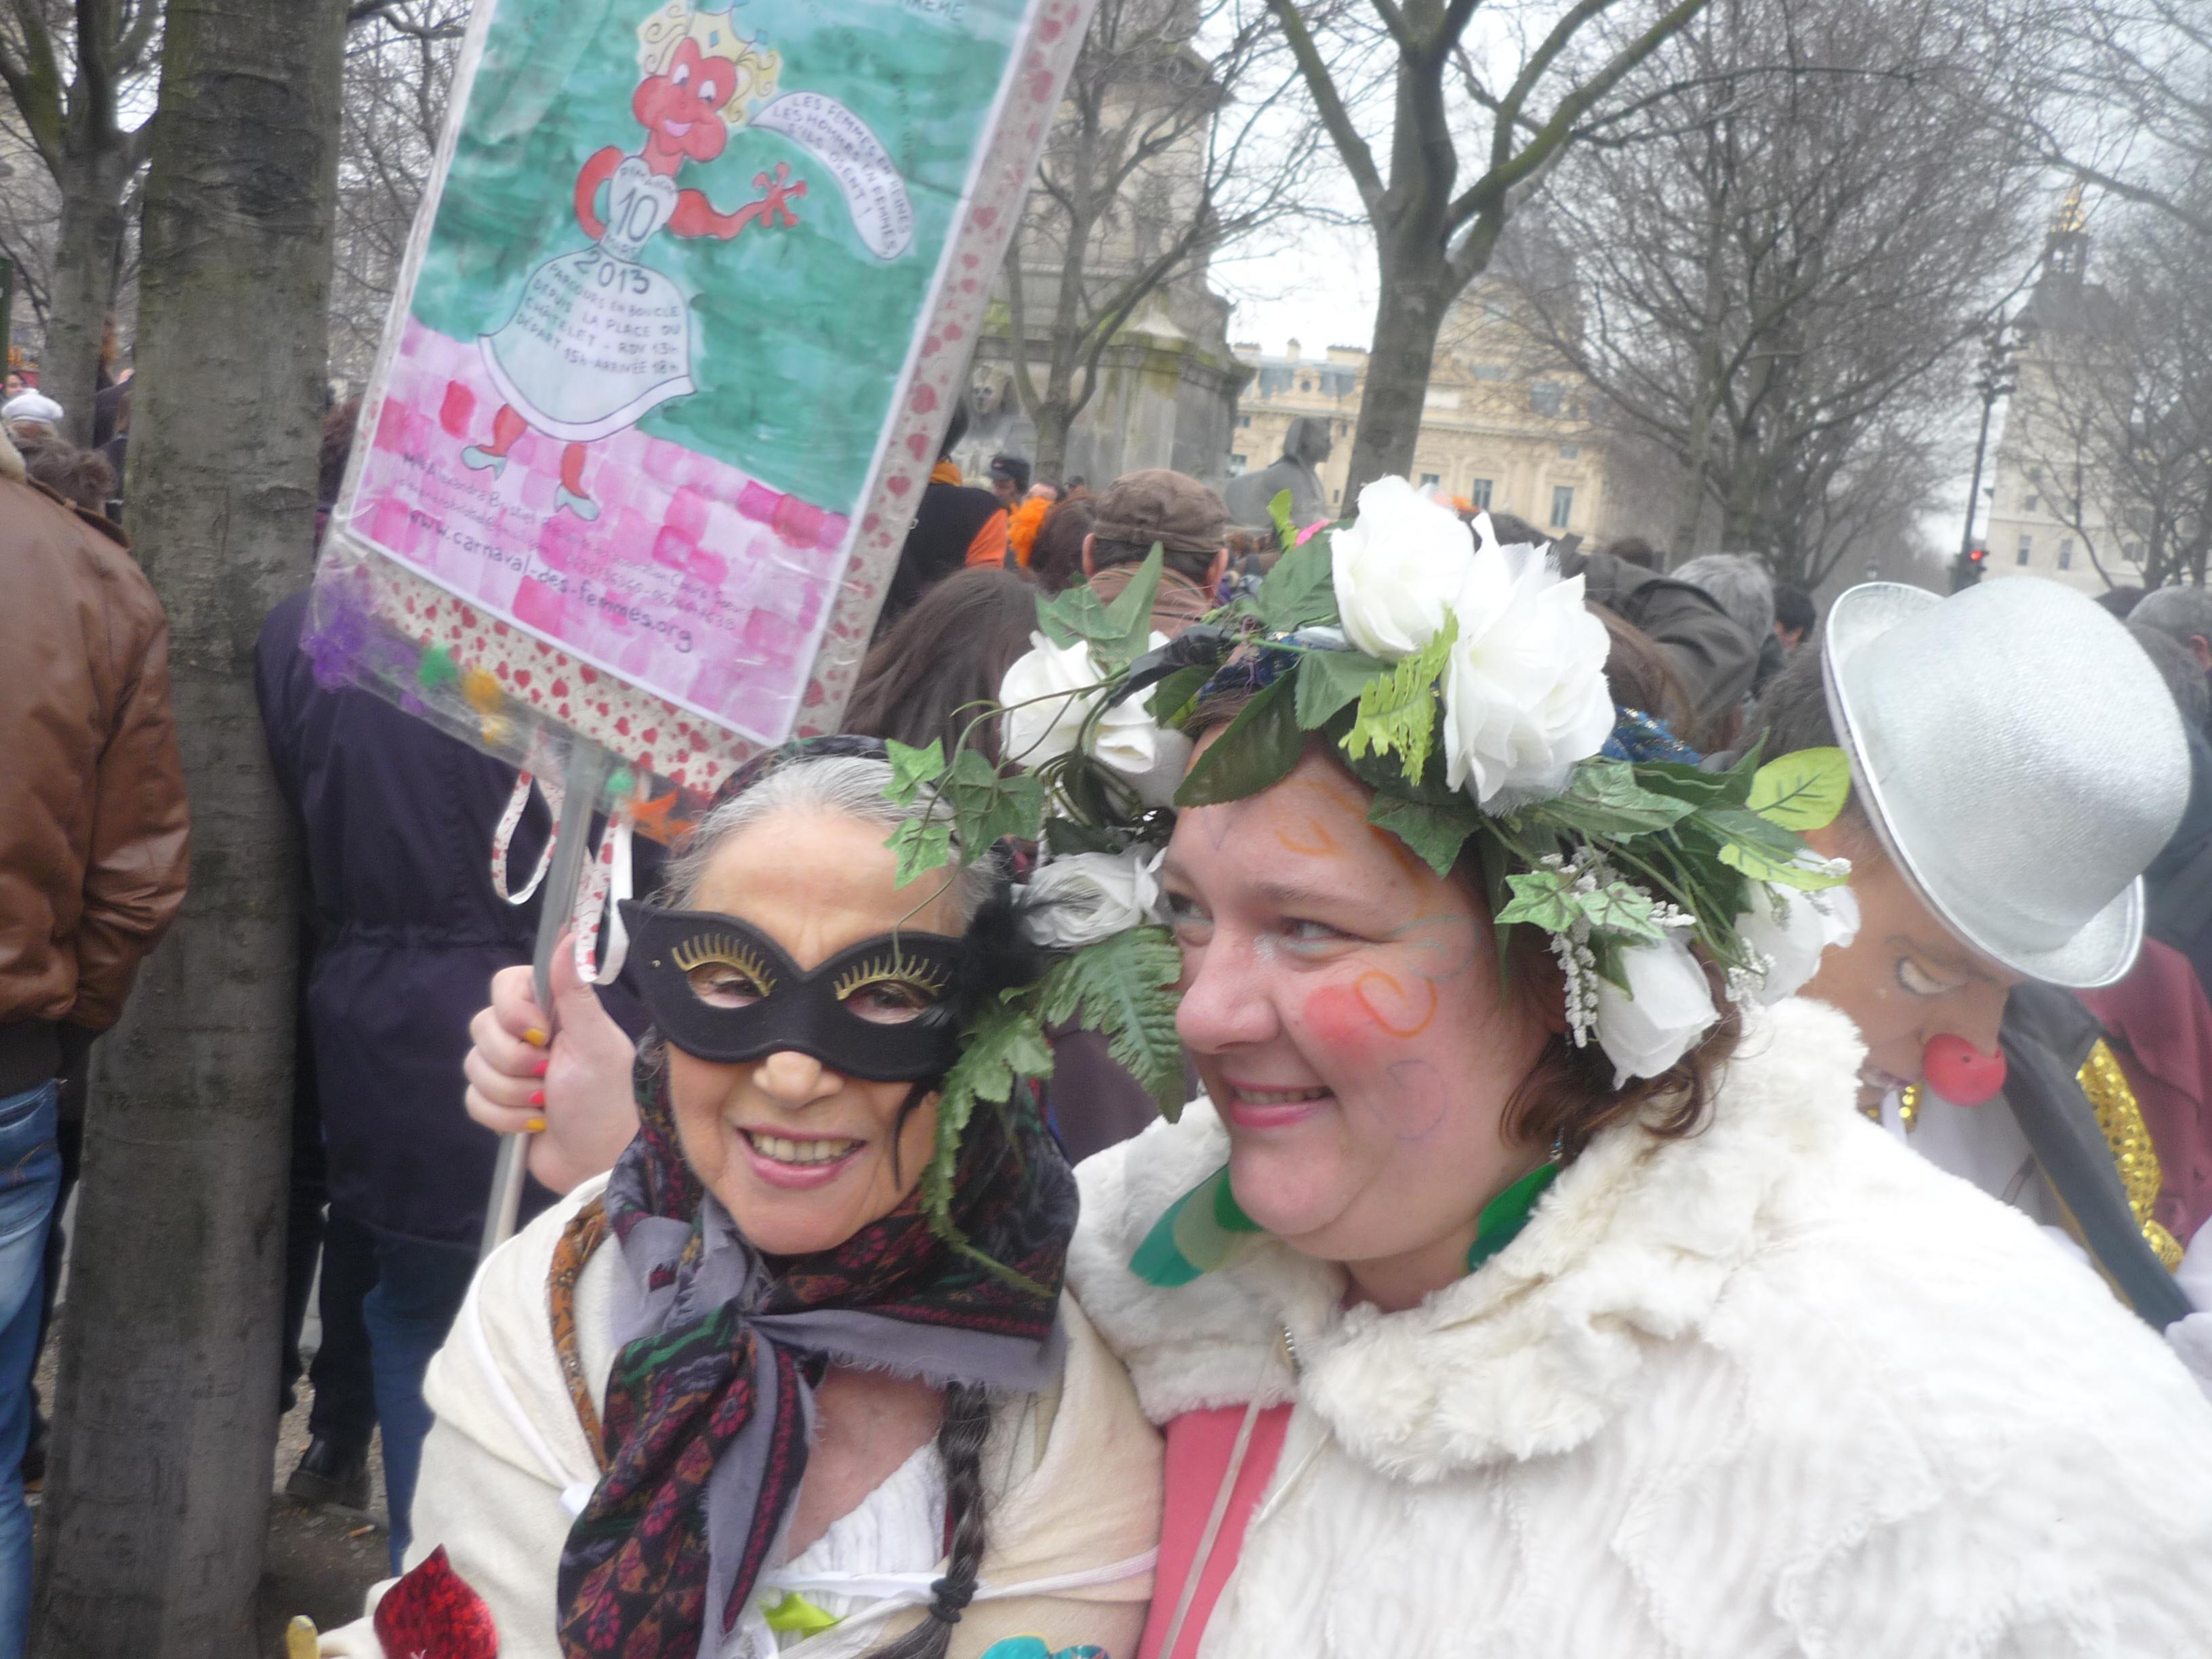 http://upload.wikimedia.org/wikipedia/commons/c/c3/Carnaval_des_Femmes_-_F%C3%AAte_des_Blanchisseuses_2013_-_Deux_carnavaleuses.JPG